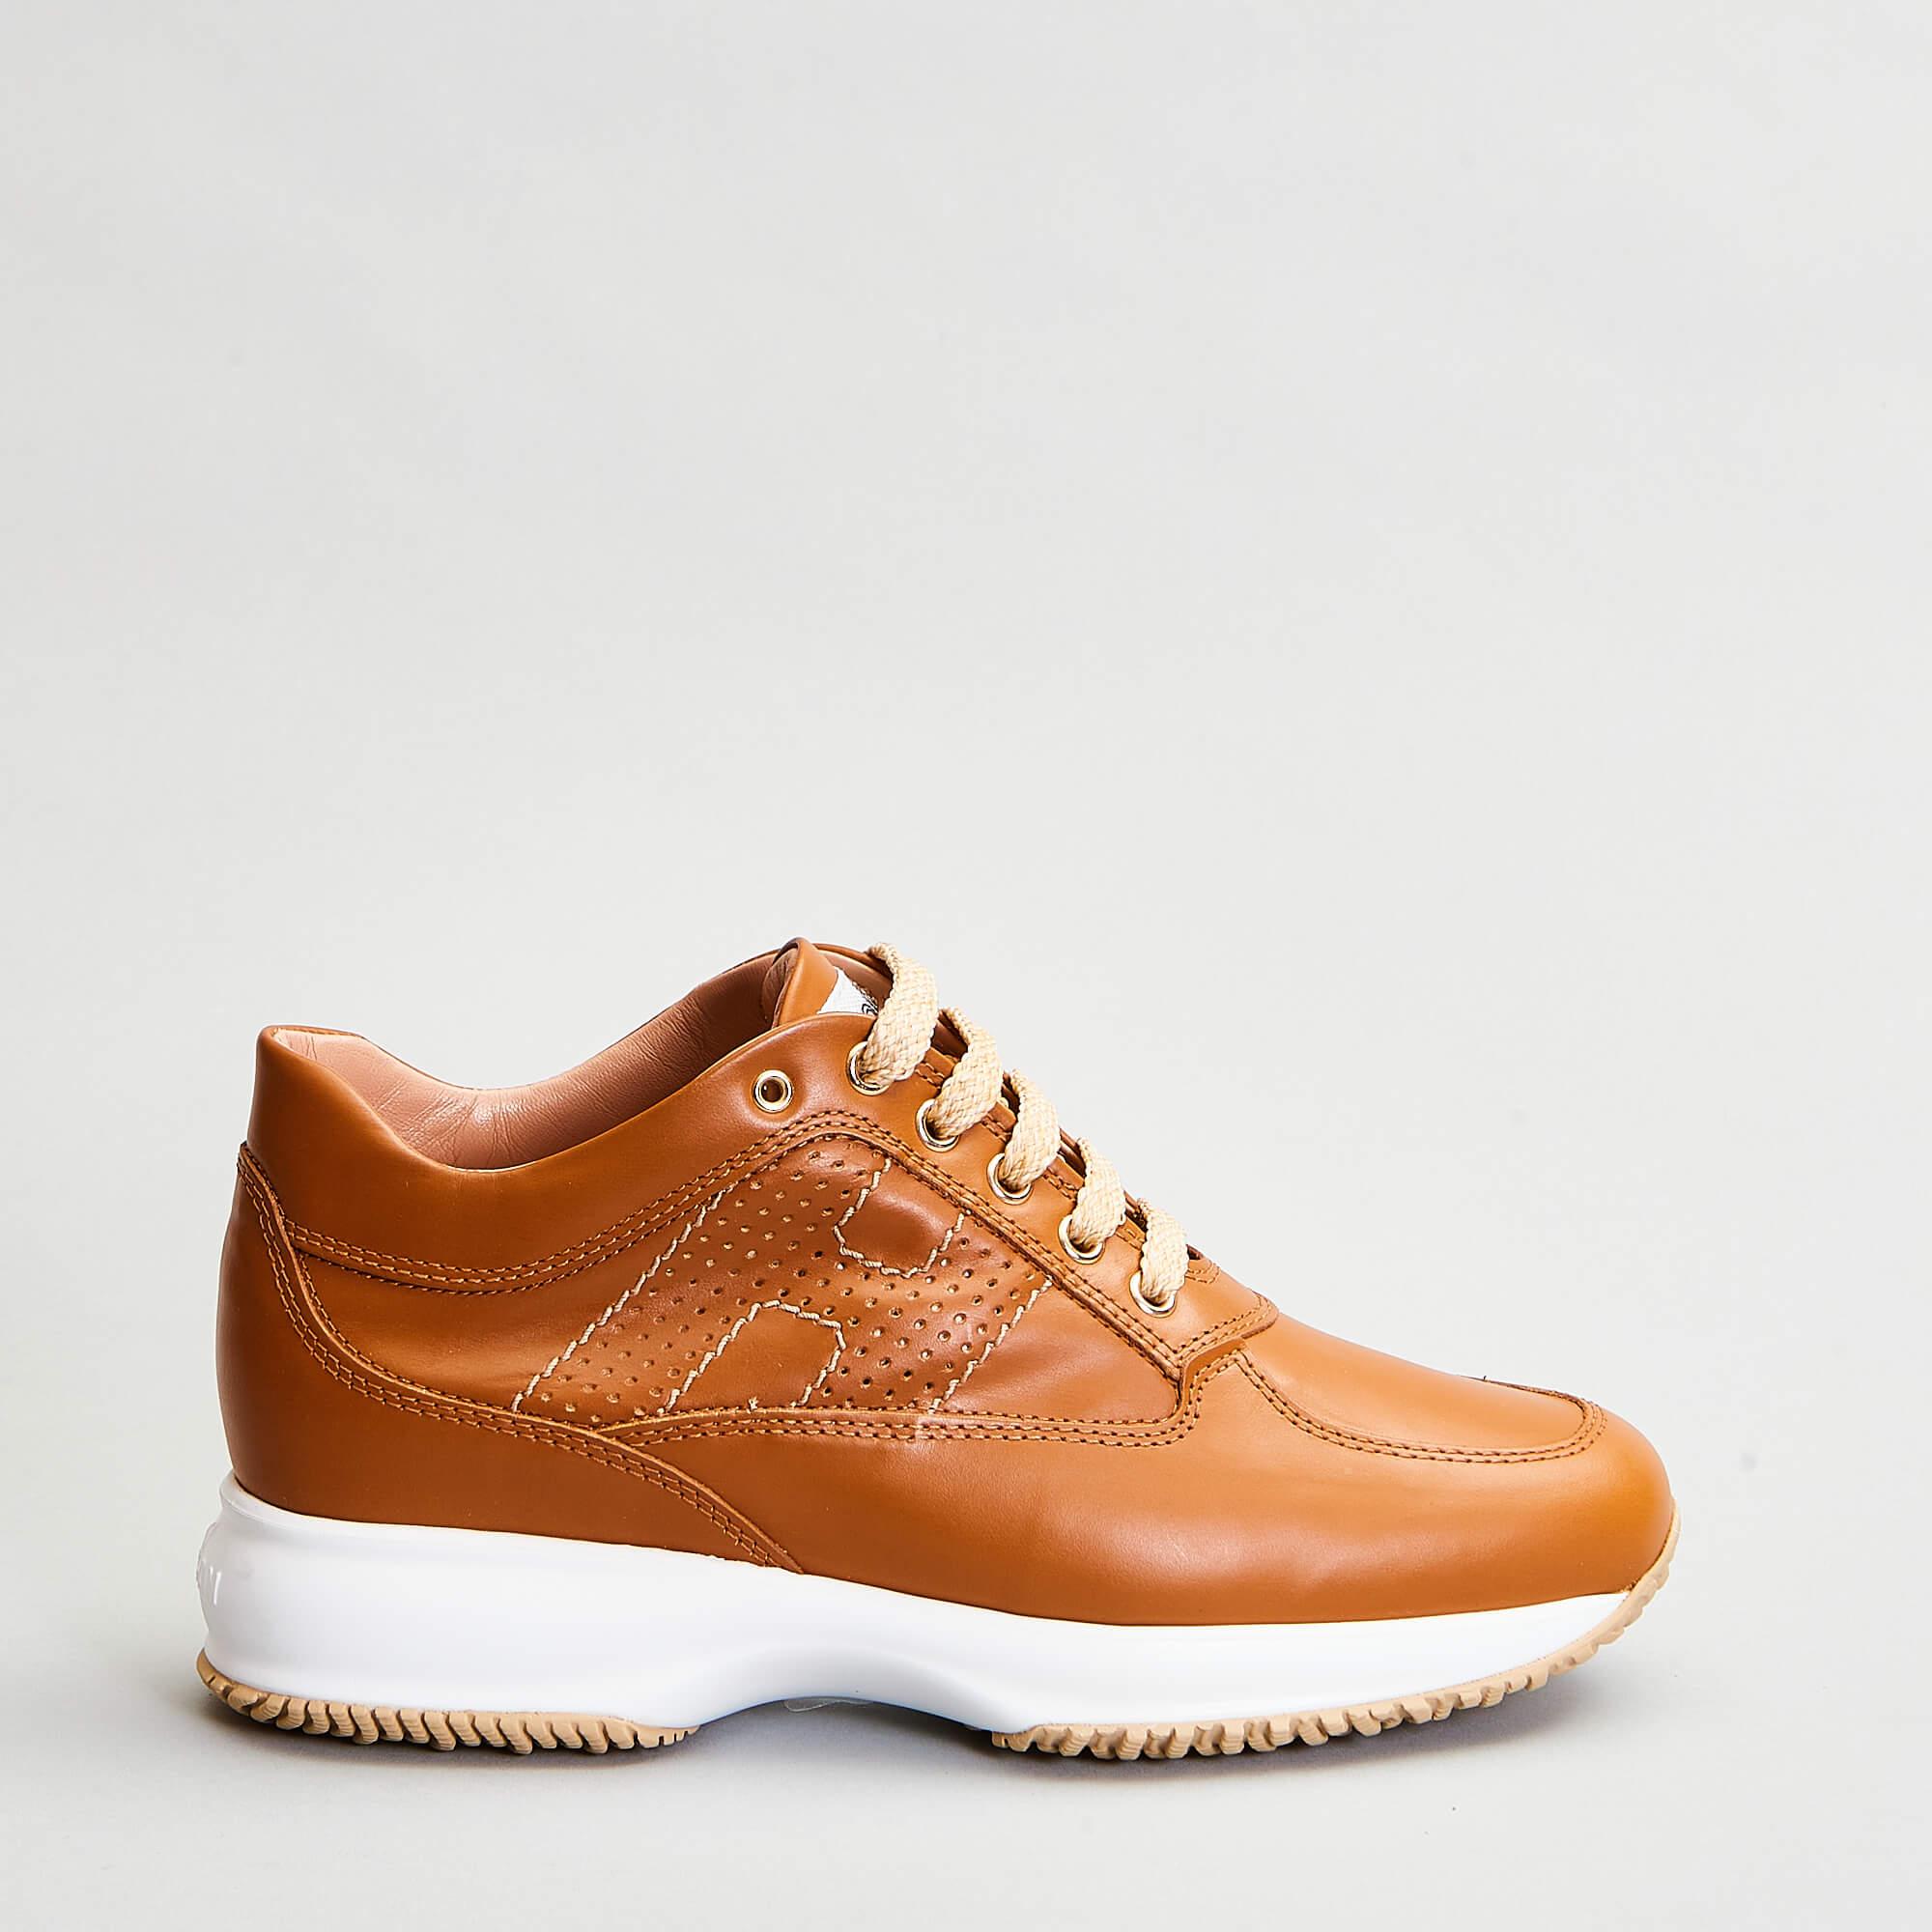 Interactive - Sneakers in pelle cuoio - Reposi Alessandria